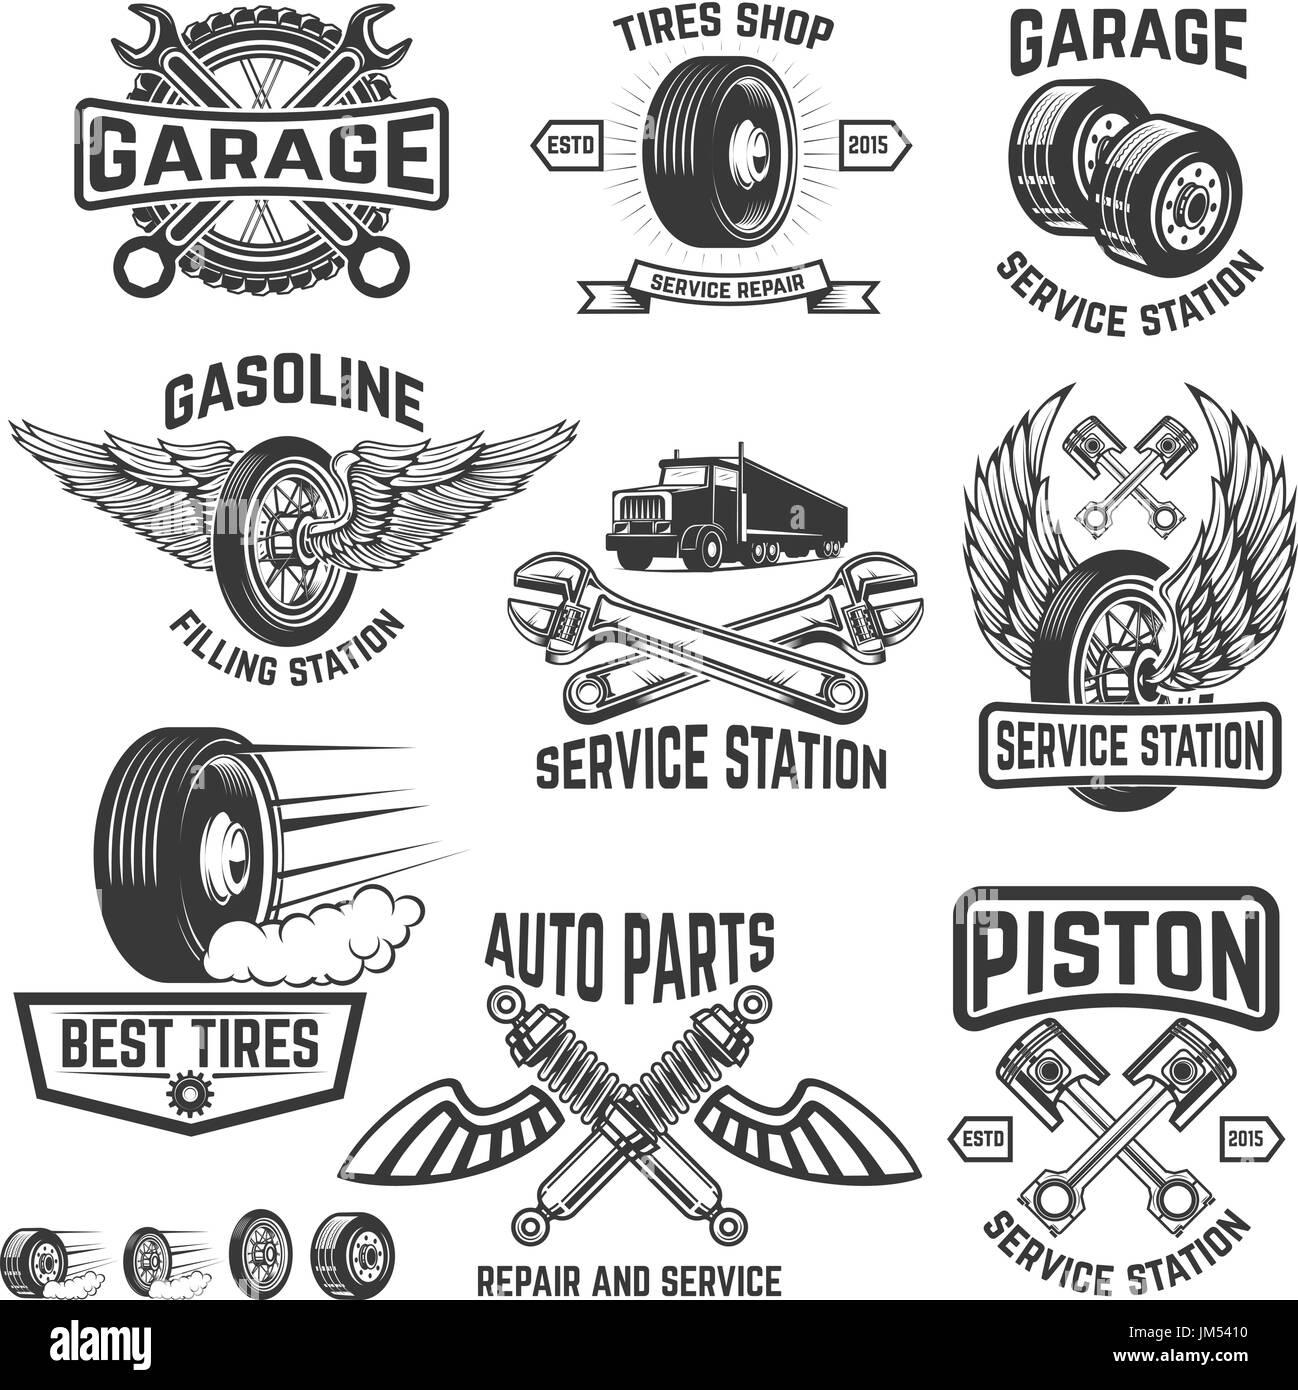 Fuel garage black and white stock photos images alamy for Garage jm auto audincourt